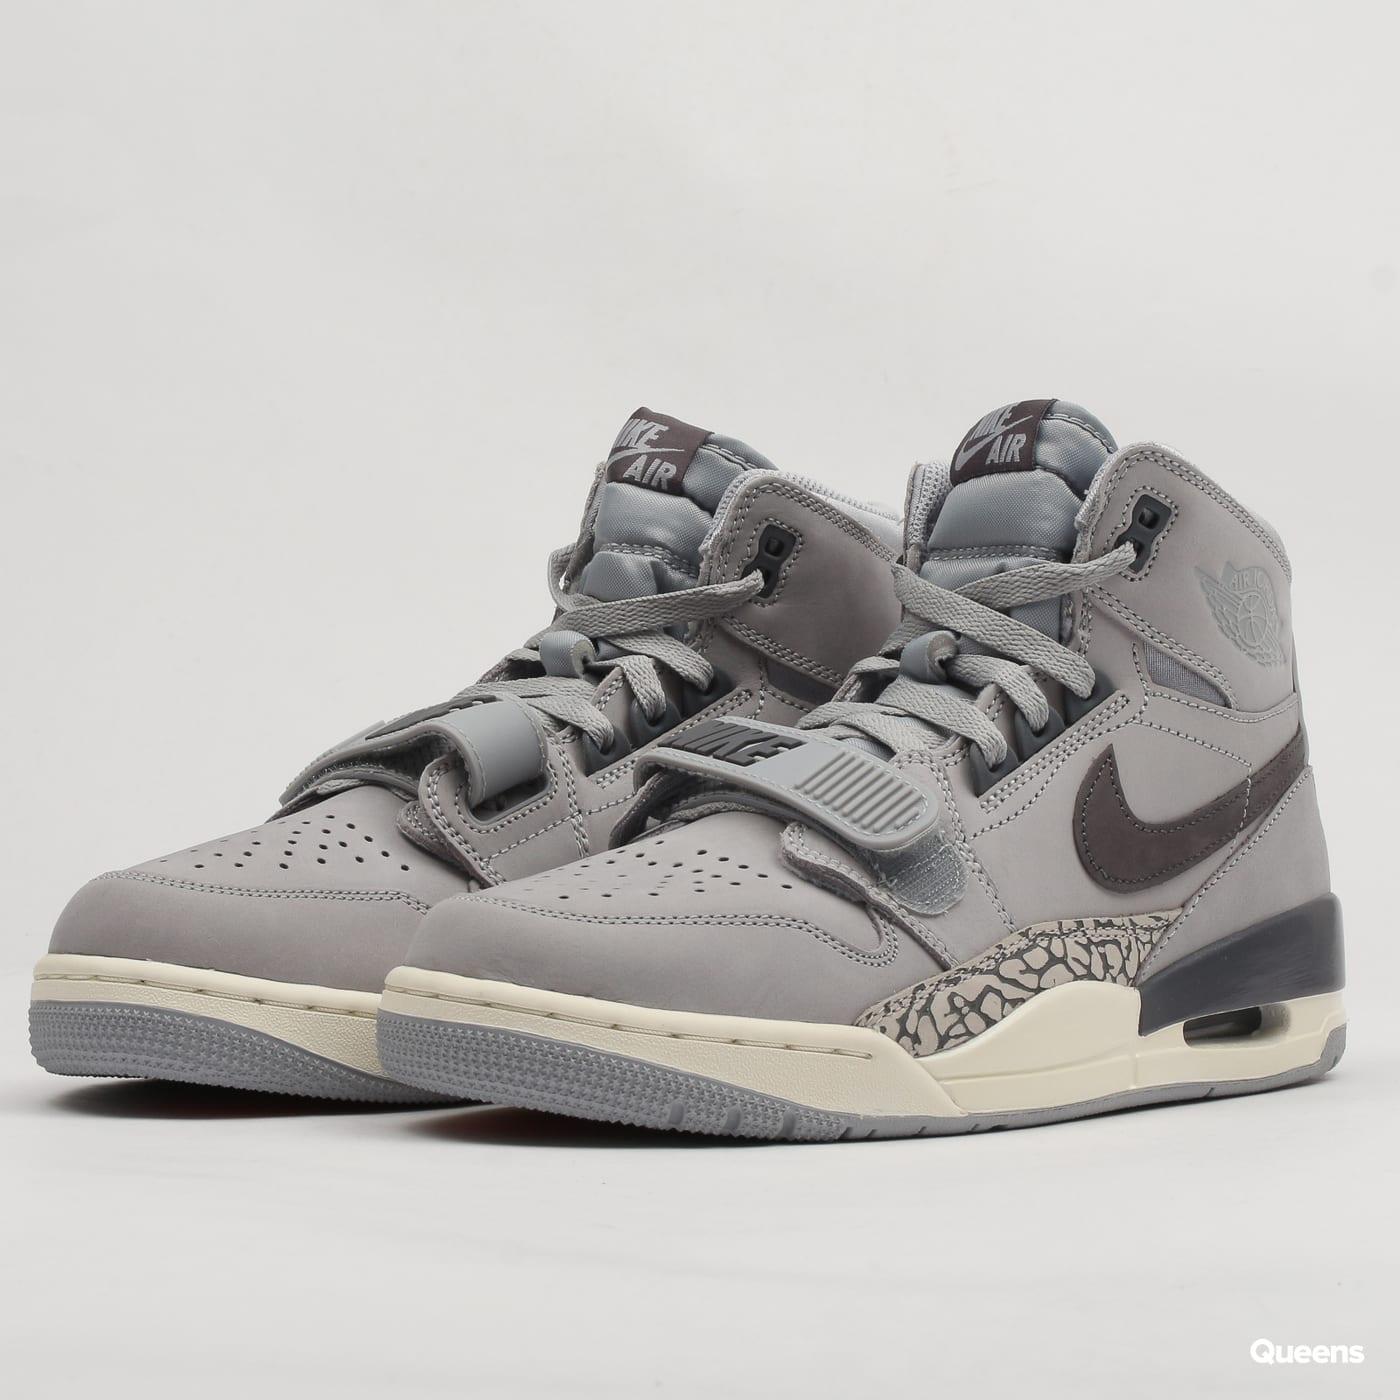 outlet store sale 7f739 29f5d Sneakers Jordan Air Jordan Legacy 312 (AV3922-002)– Queens 💚